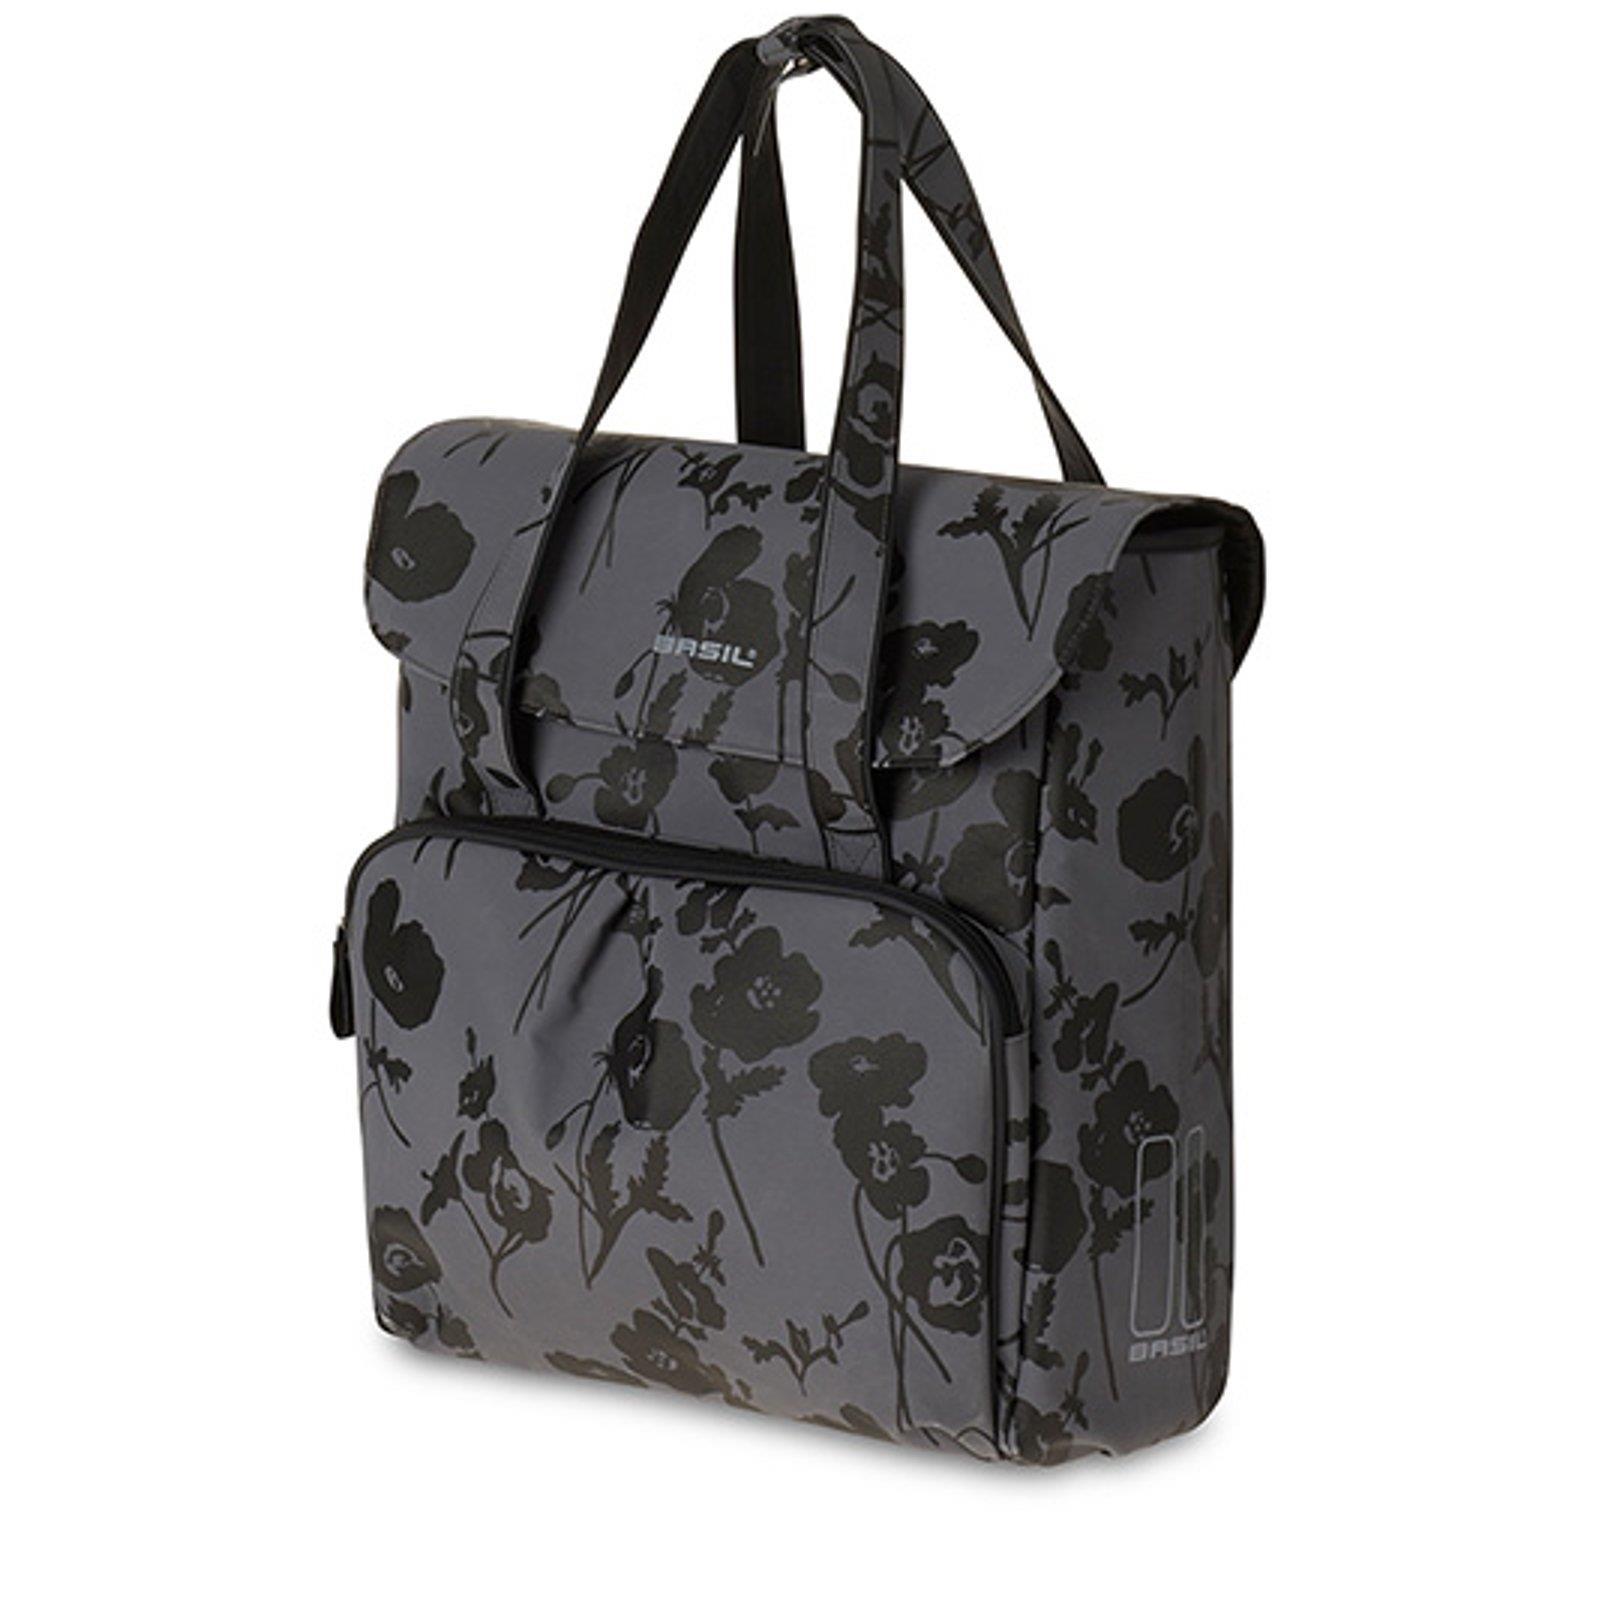 basil elegance shopper tasche fahrrad 24 l fahrradtasche einkaufs packtasche. Black Bedroom Furniture Sets. Home Design Ideas